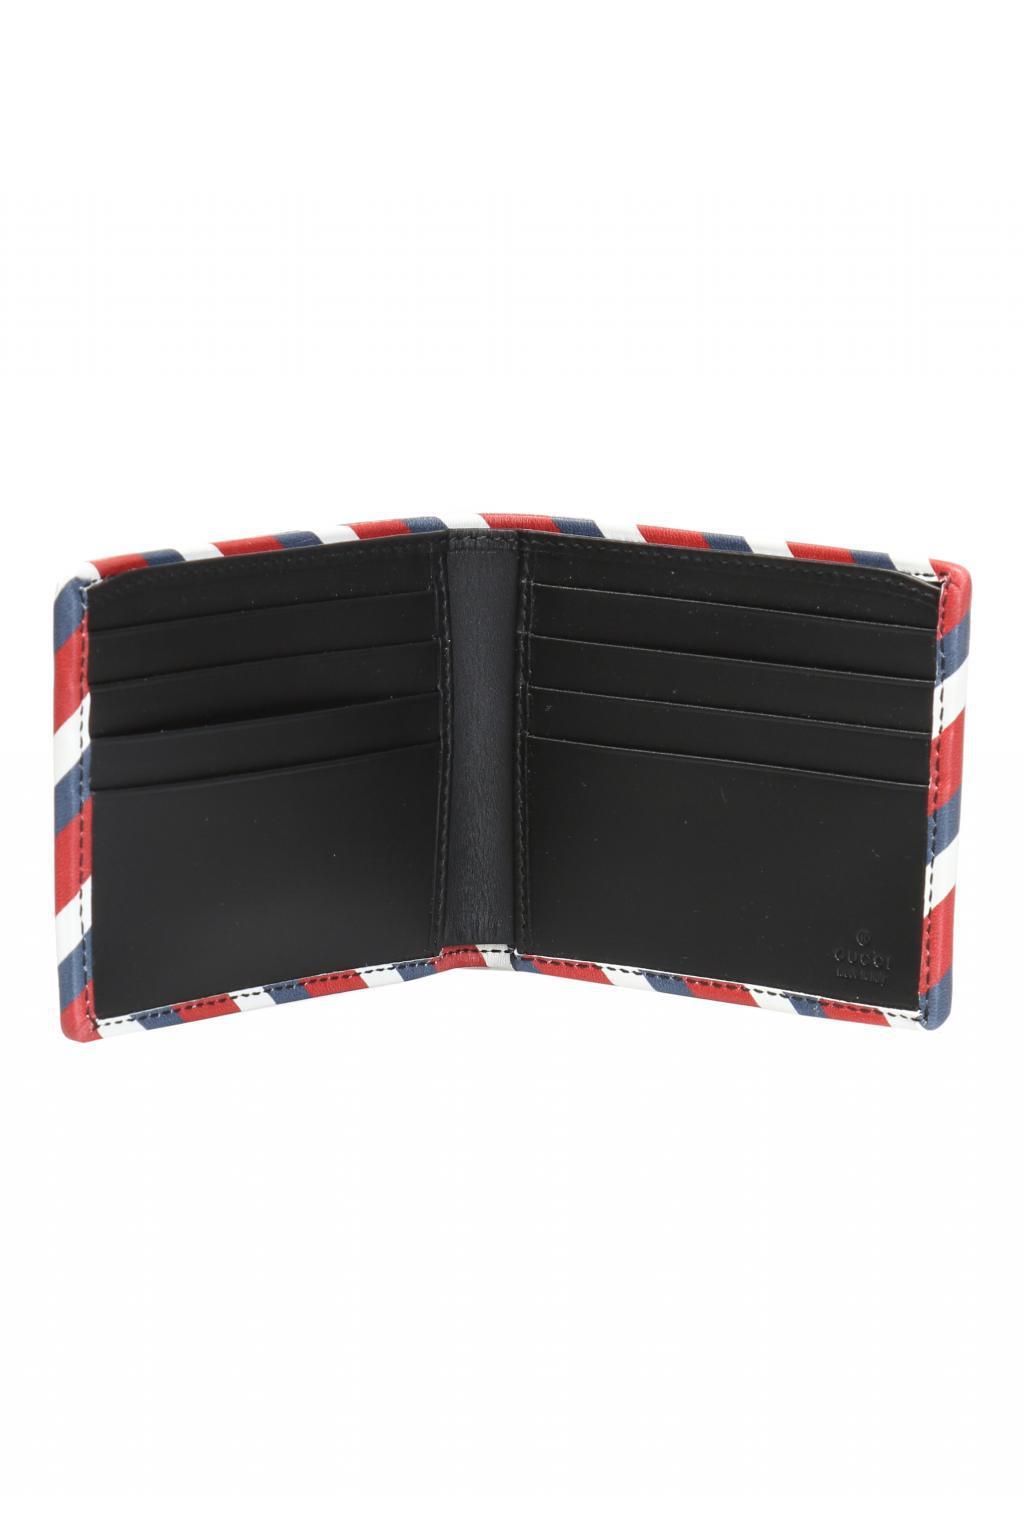 9780d72300cb Gucci - Multicolor 'GG Supreme' Canvas Bi-fold Wallet for Men - Lyst. View  fullscreen